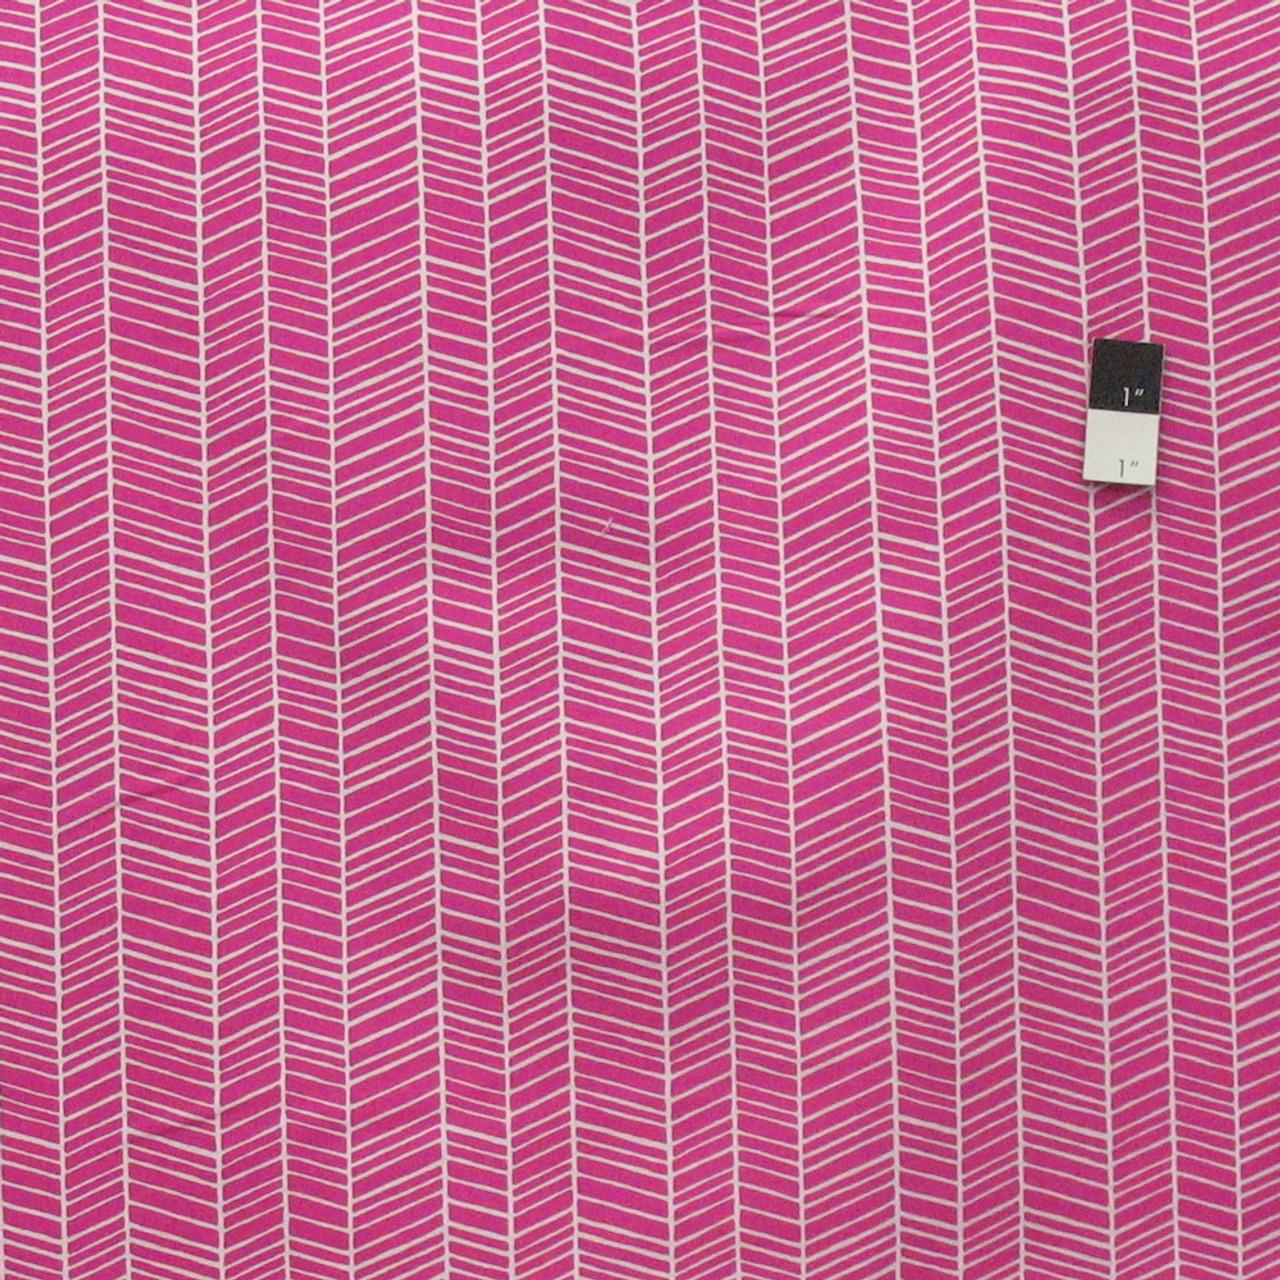 Joel Dewberry PWTC007 True Colors Herringbone Fuchsia Cotton Fabric By Yard